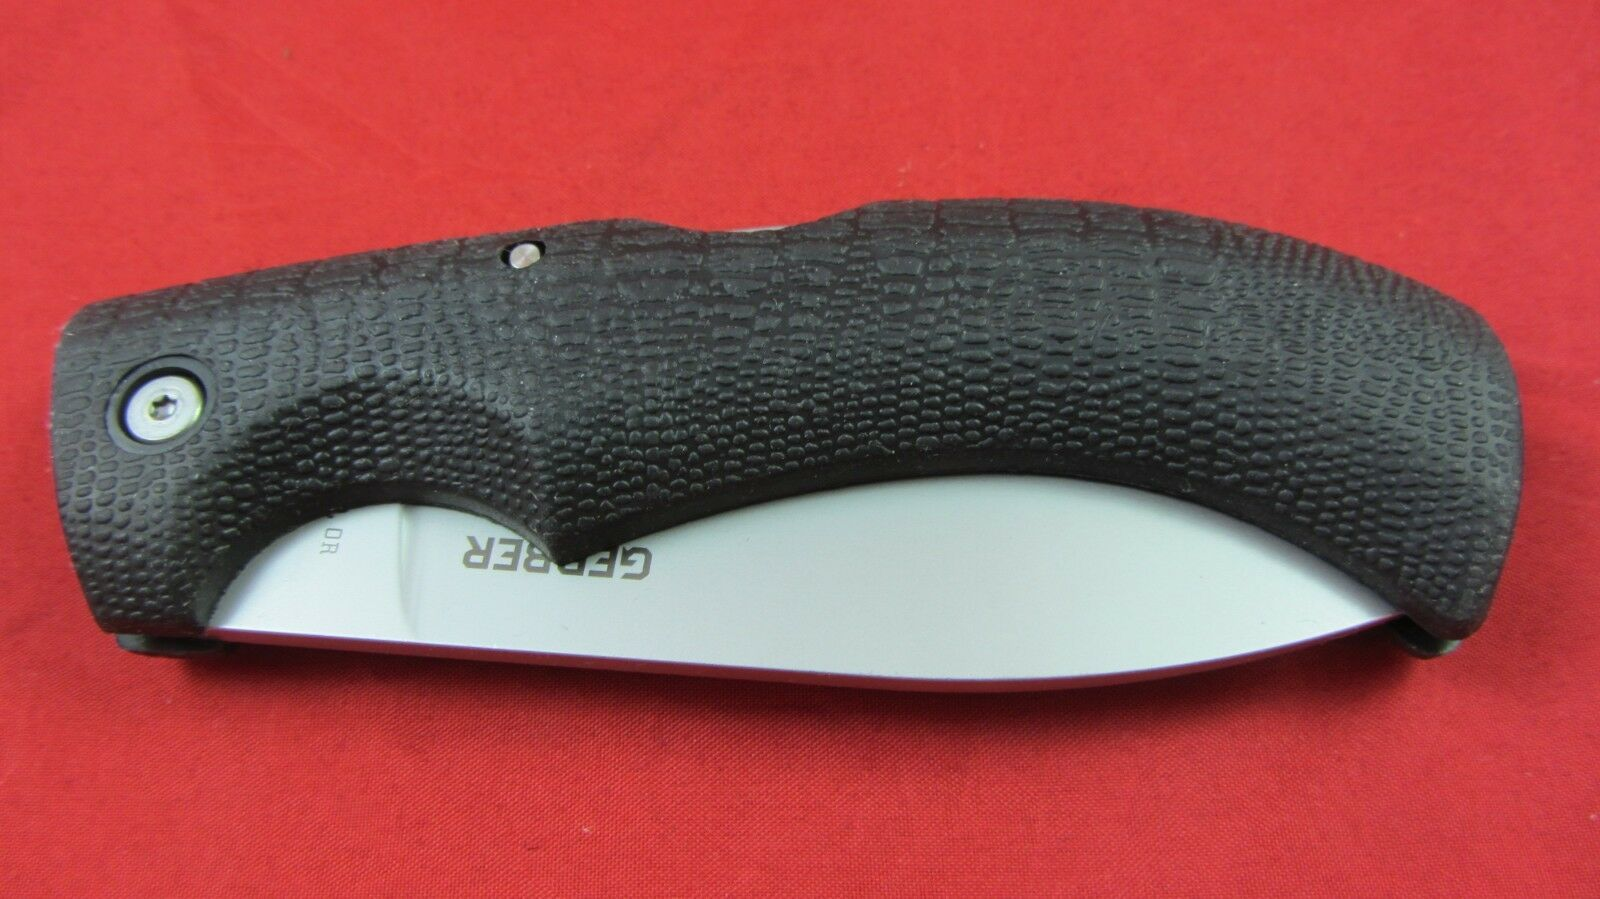 Фото 11 - Складной нож Gerber Gator 154, сталь 154CM, рукоять glassfilled